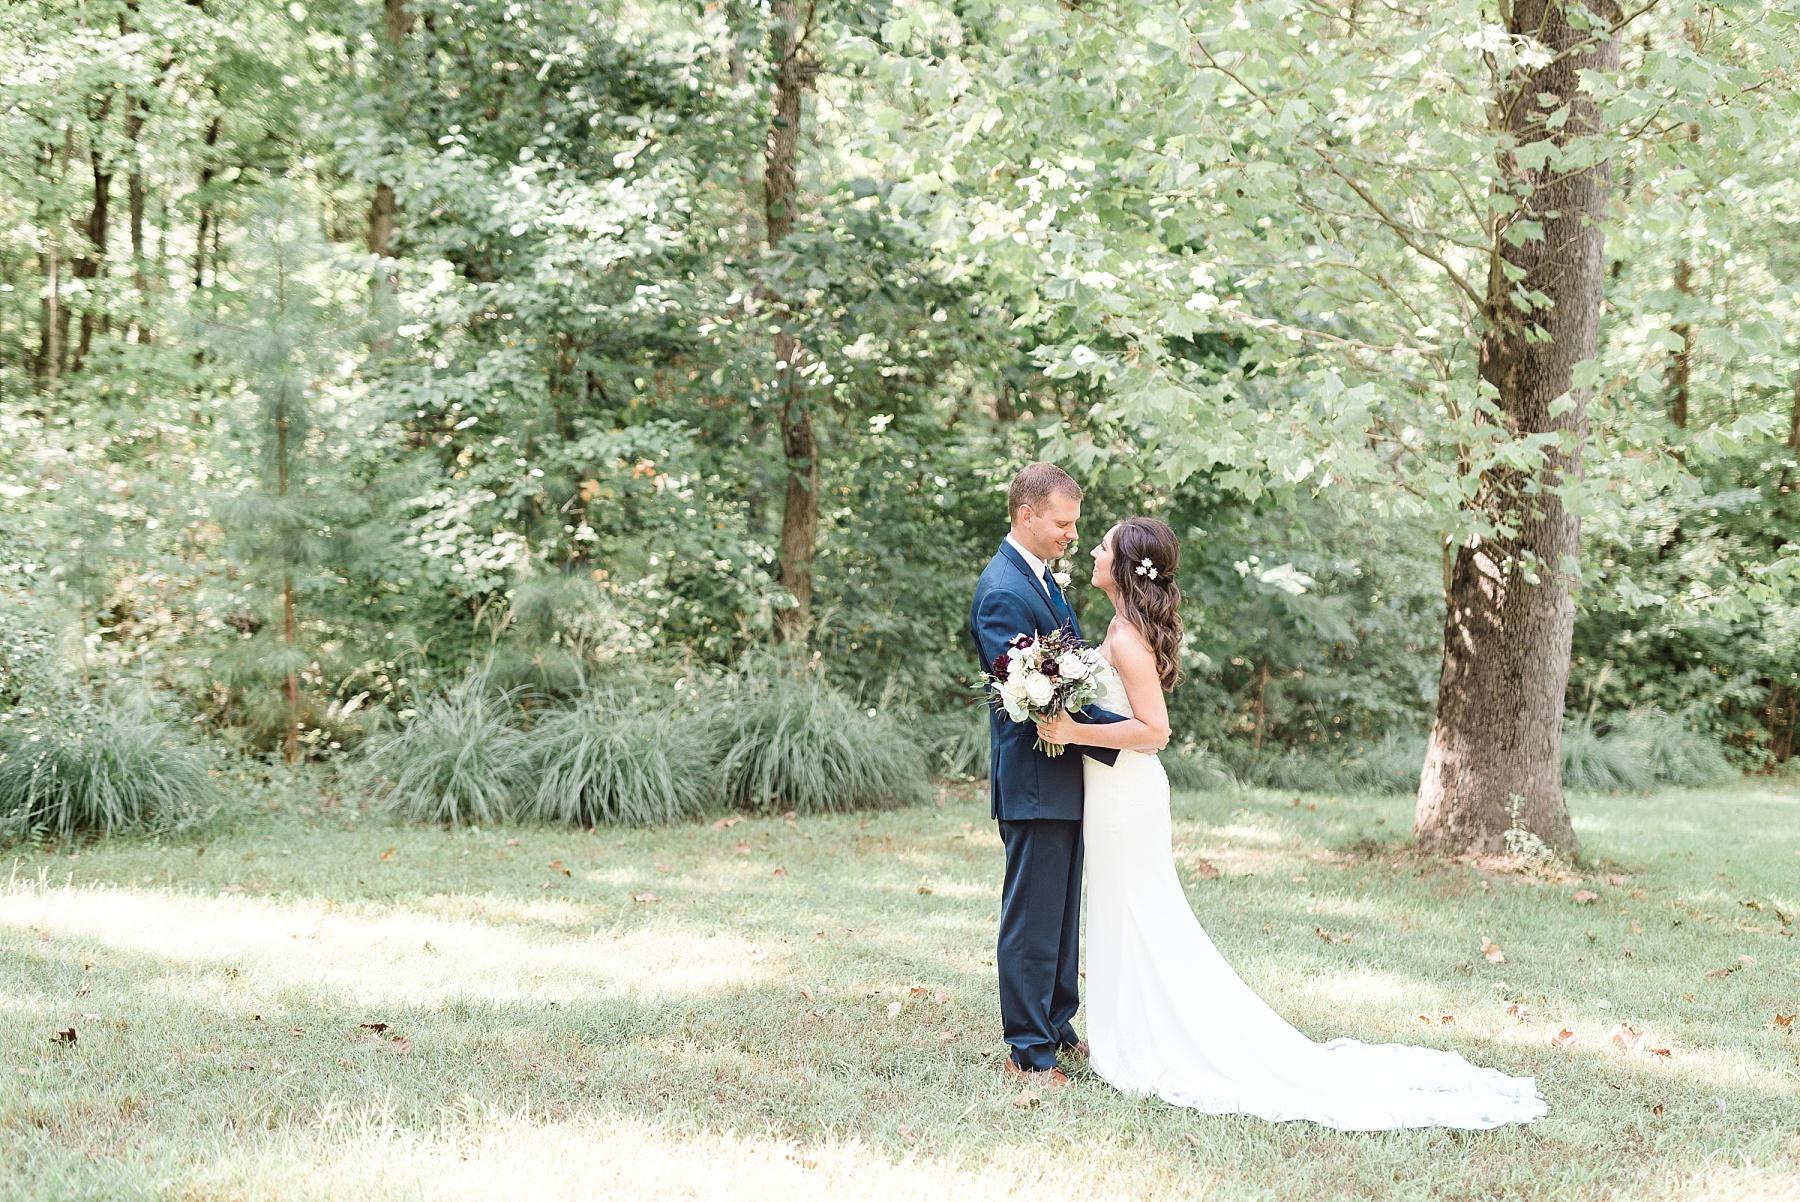 Romantic Summer Sunset Wedding Ceremony at Little Piney Lodge St. Louis Missouri by Kelsi Kliethermes Photography Fine Art Photographer_0001.jpg